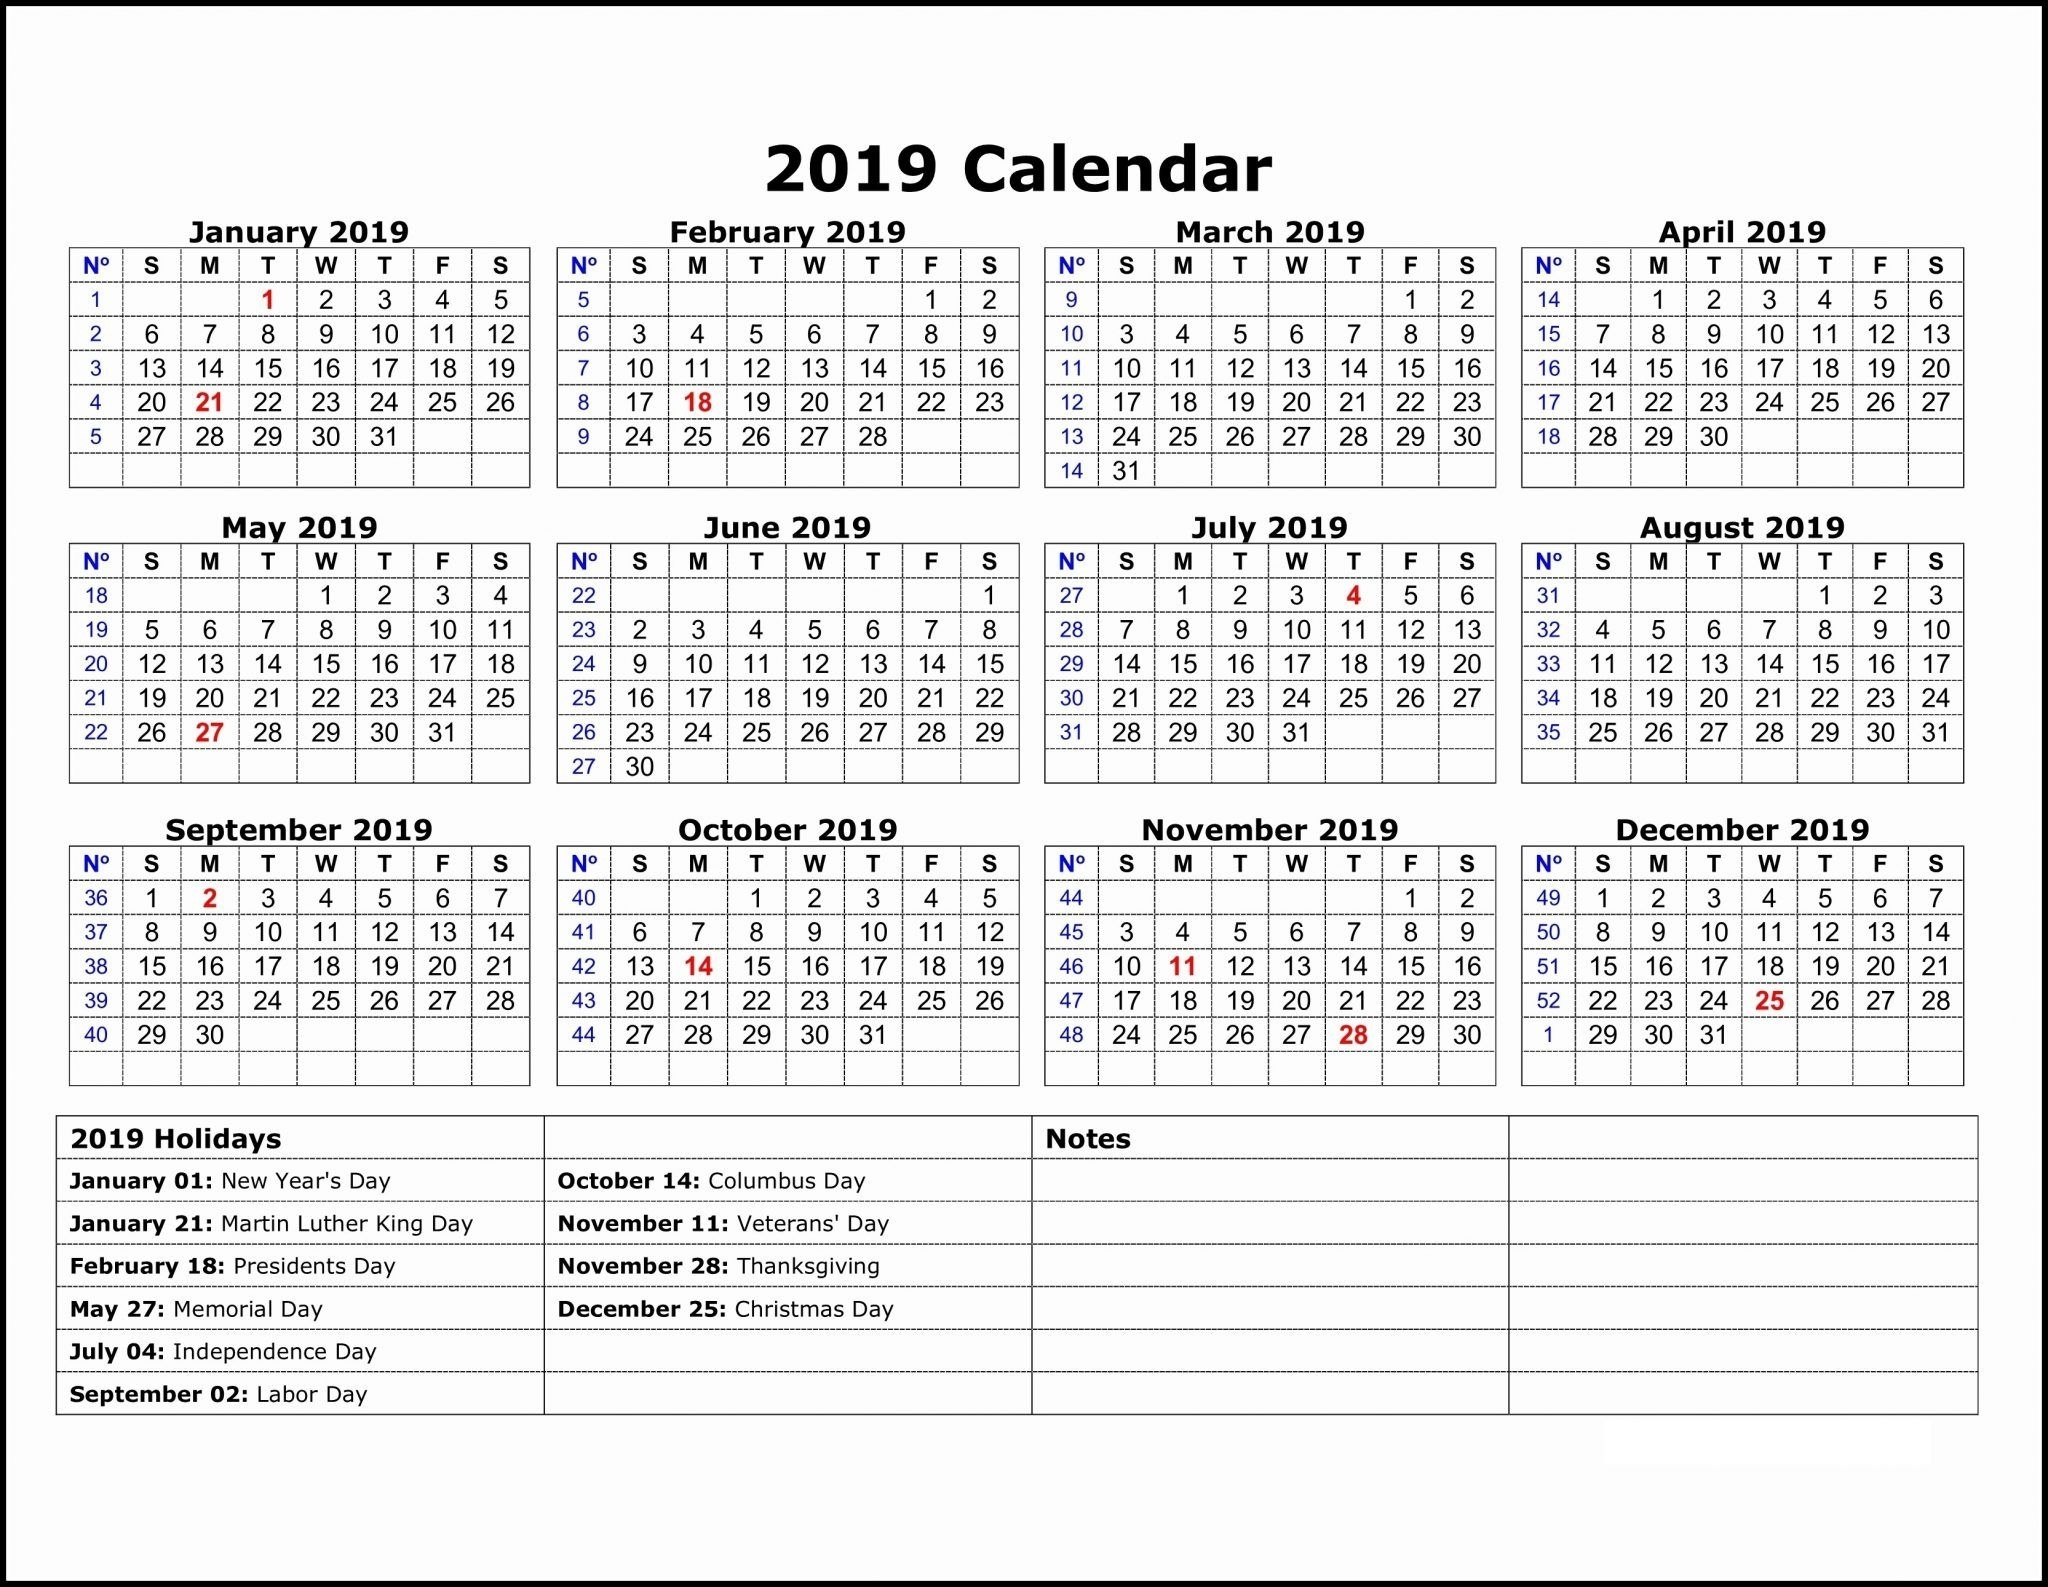 2019 Calendar Template One Page | Printable Calendar